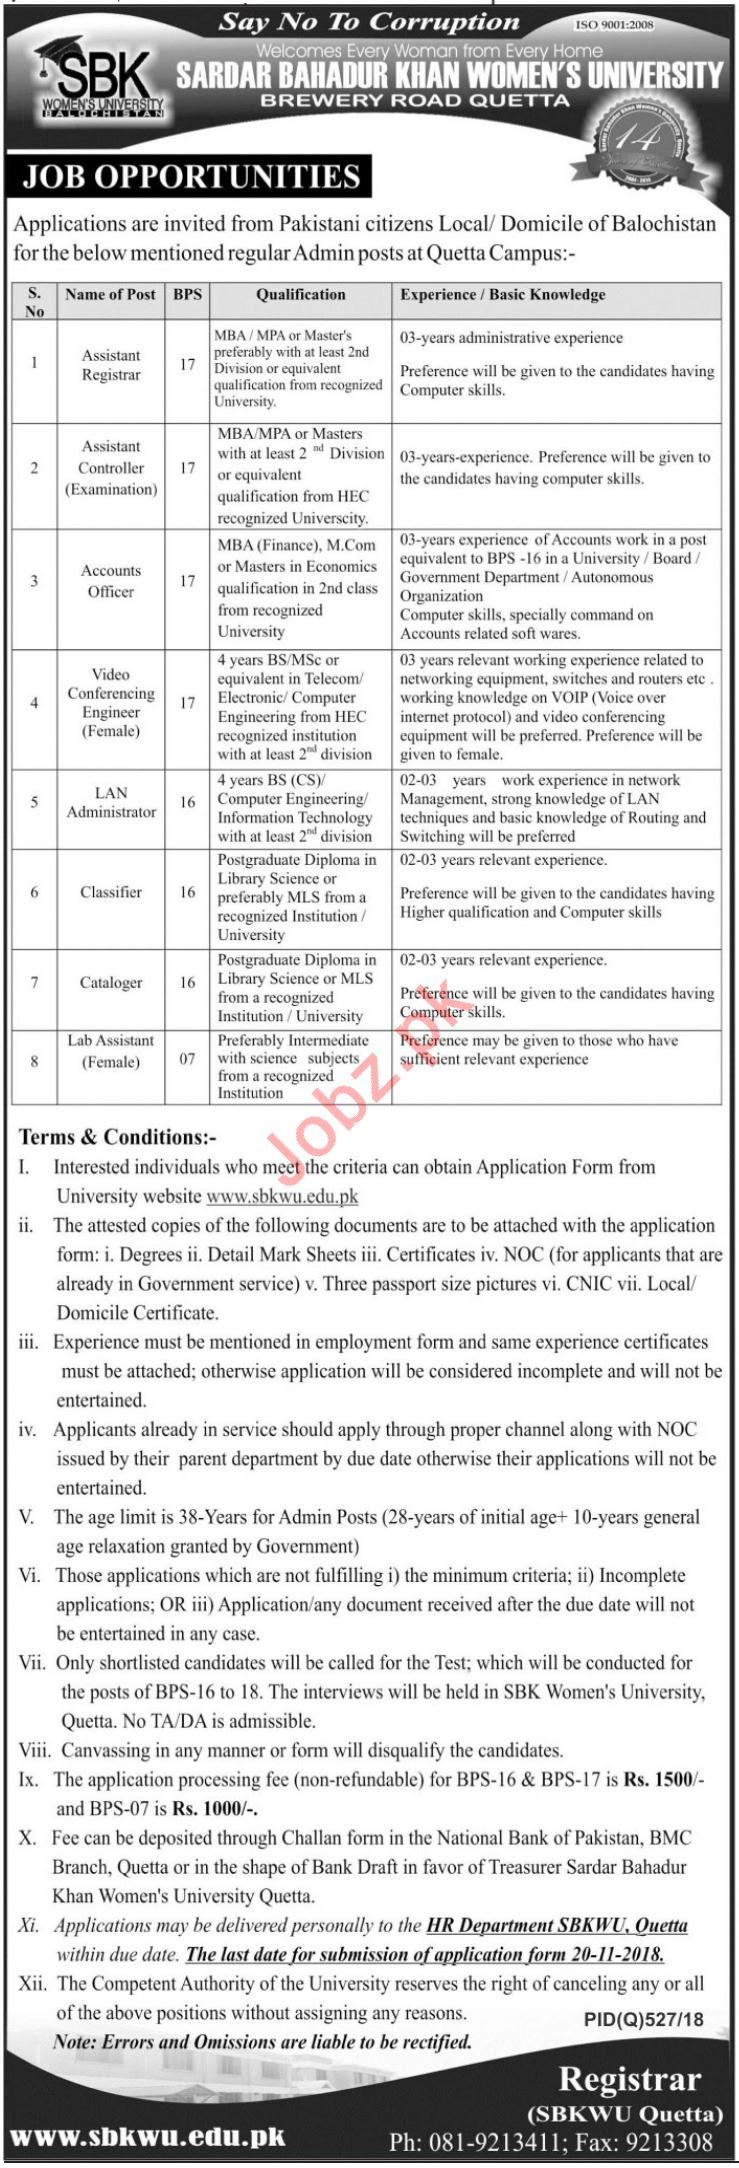 Sardar Bahadur Khan Women University Admin Jobs 2018